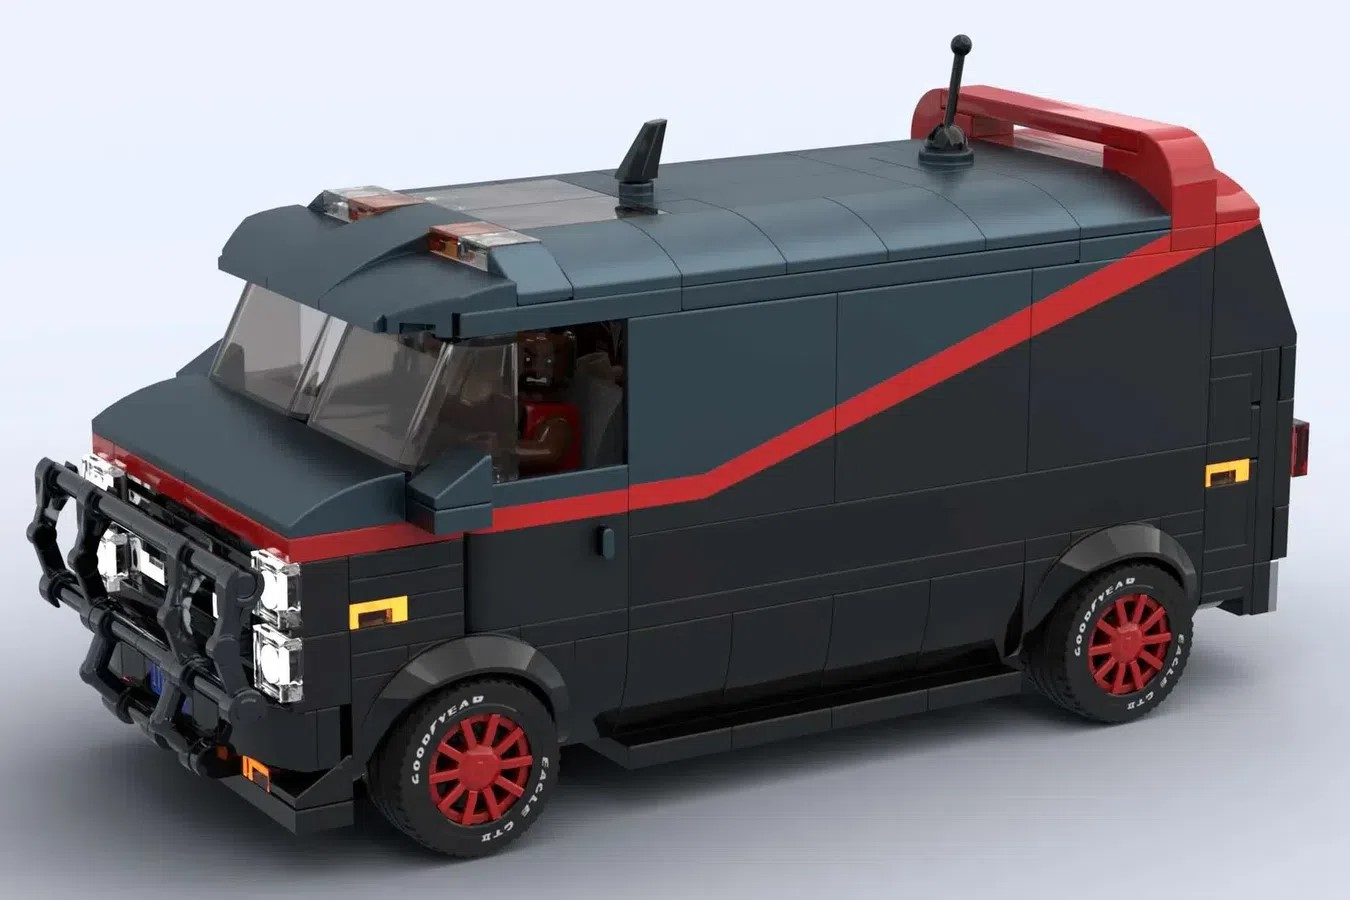 LEGO Ideas The A-team Van and Crew